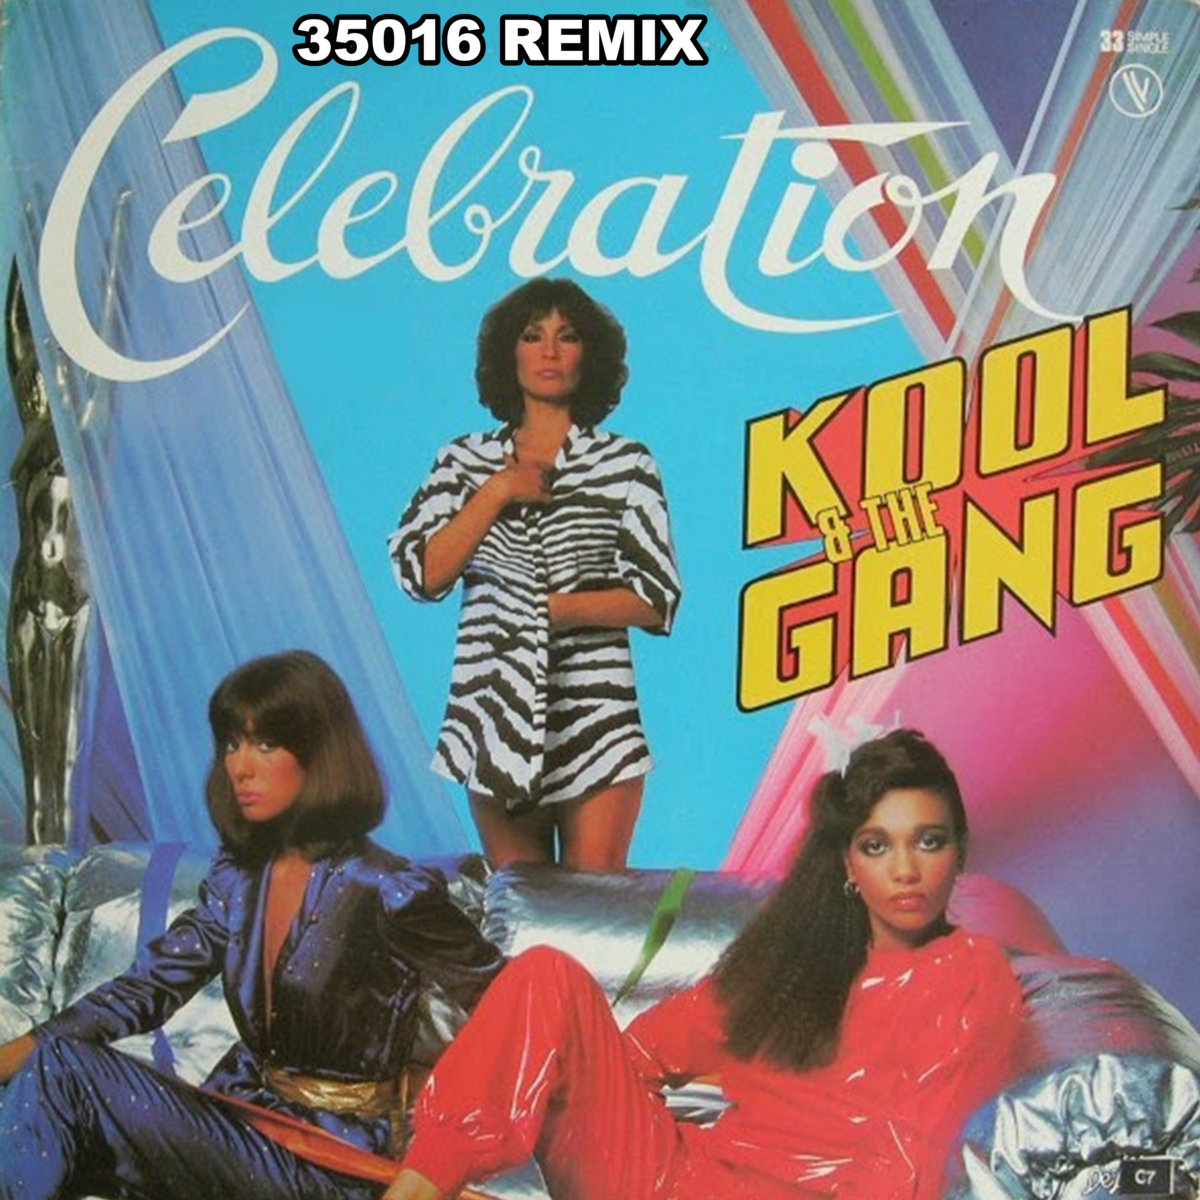 Celebration — kool & the gang | last. Fm.